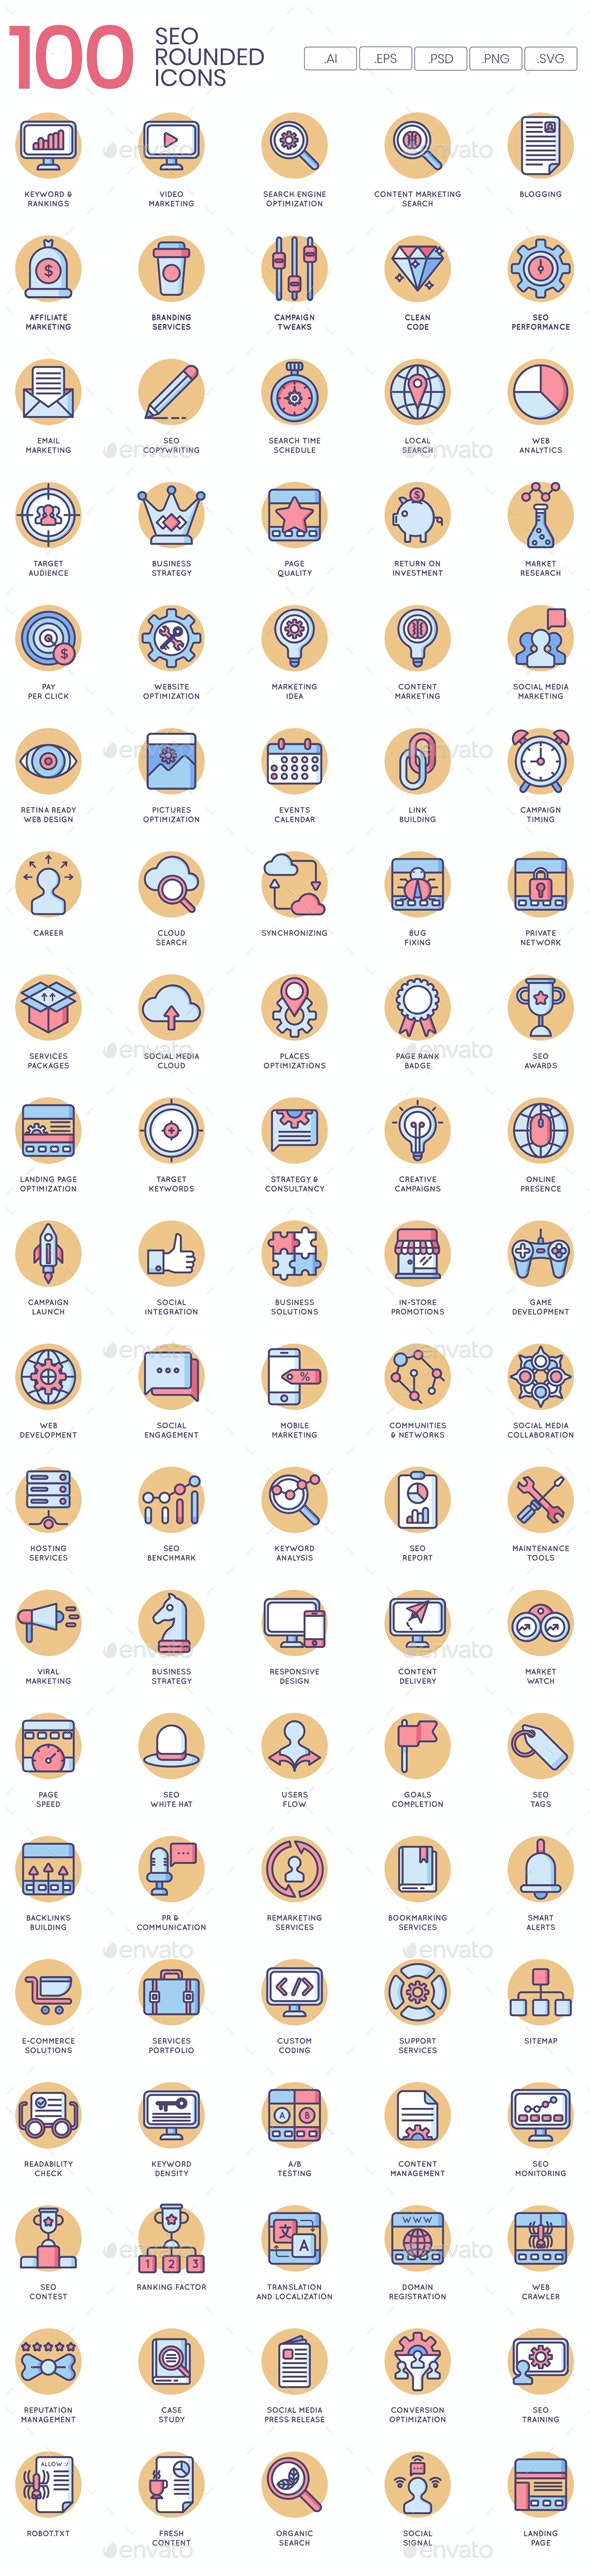 SEO Icons - Butterscotch Series - Web Icons